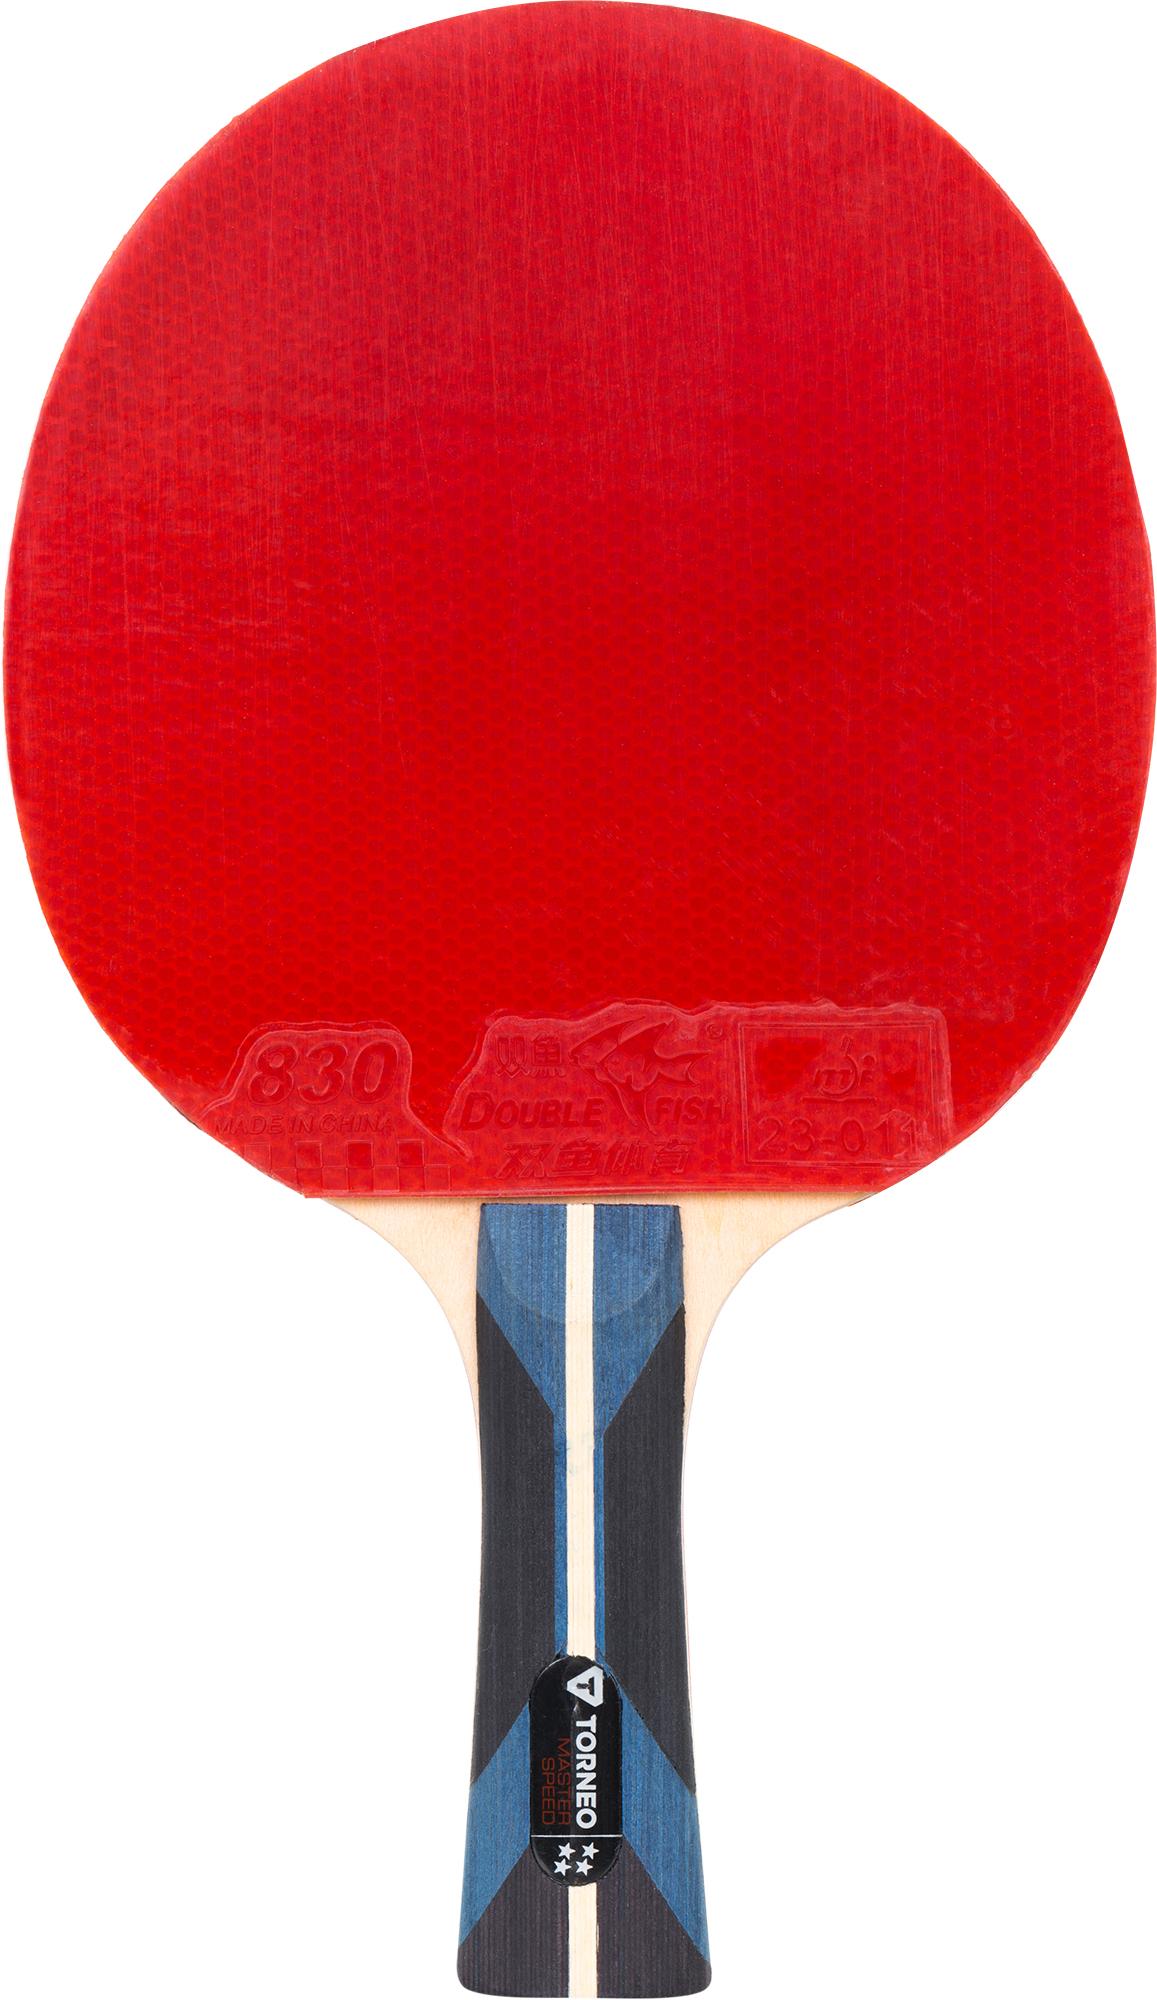 Torneo Ракетка для настольного тенниса Torneo Master Speed torneo ракетка для настольного тенниса torneo training